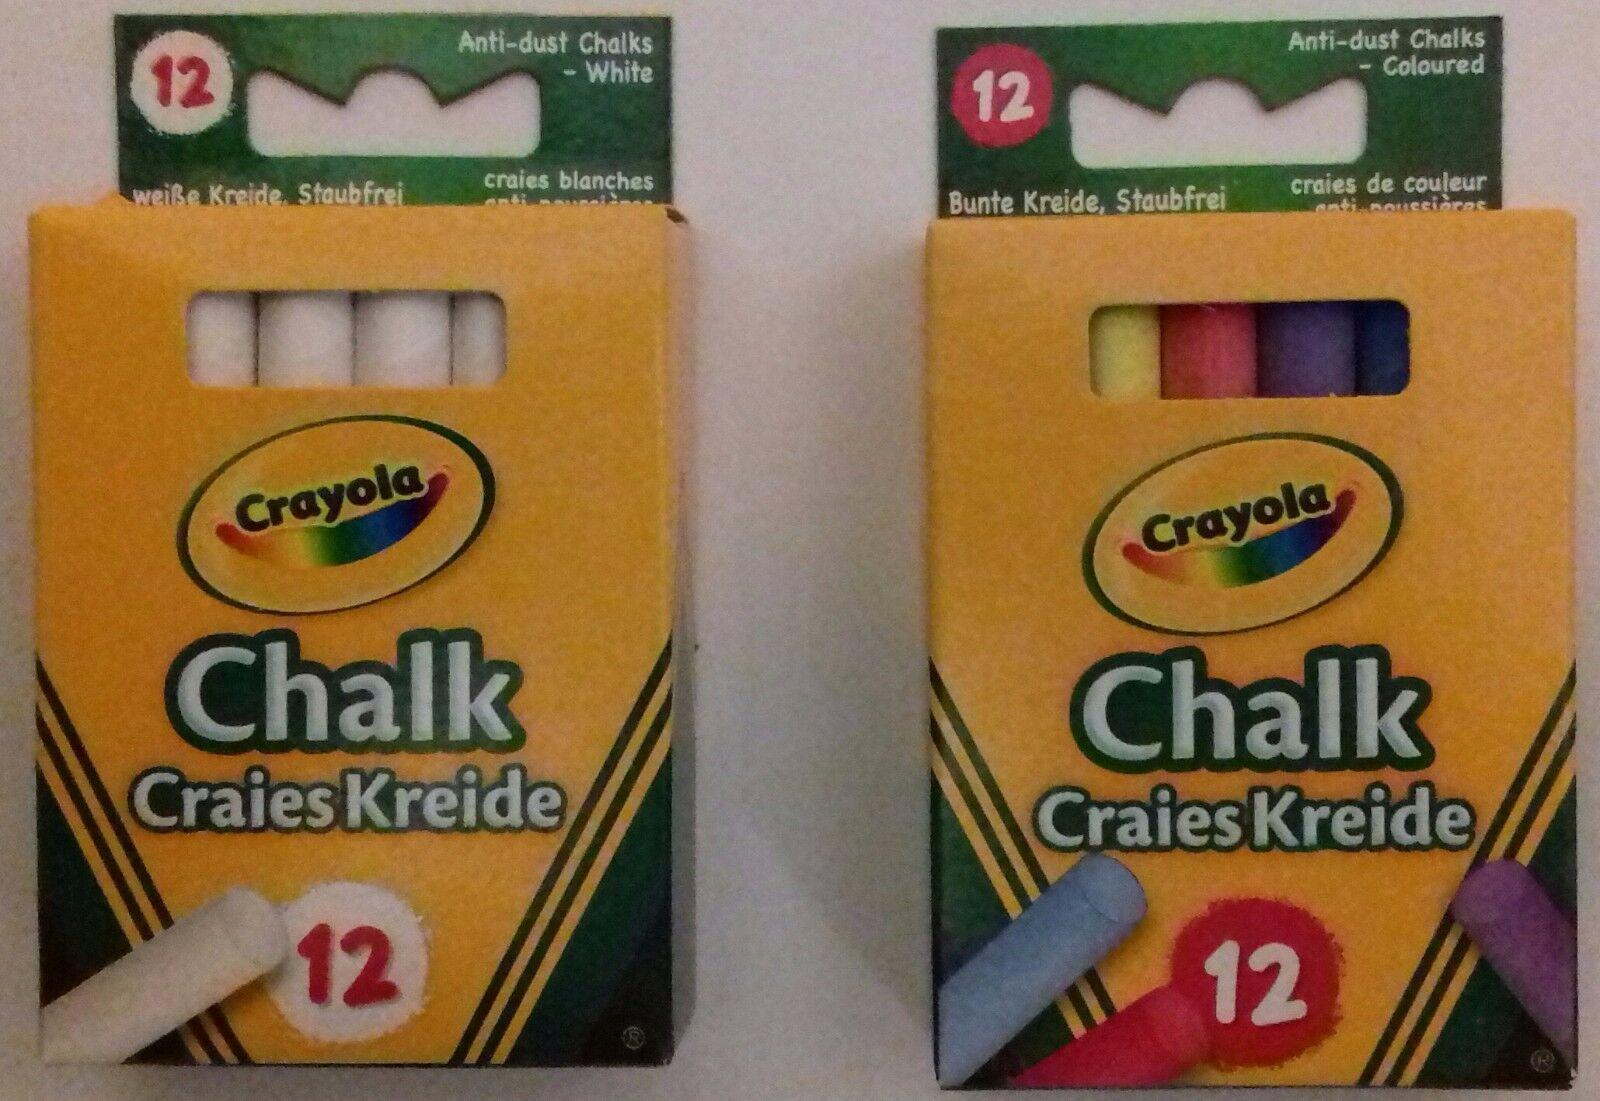 Anti Dust Assorted Chalk Crayola 1 by Crayola